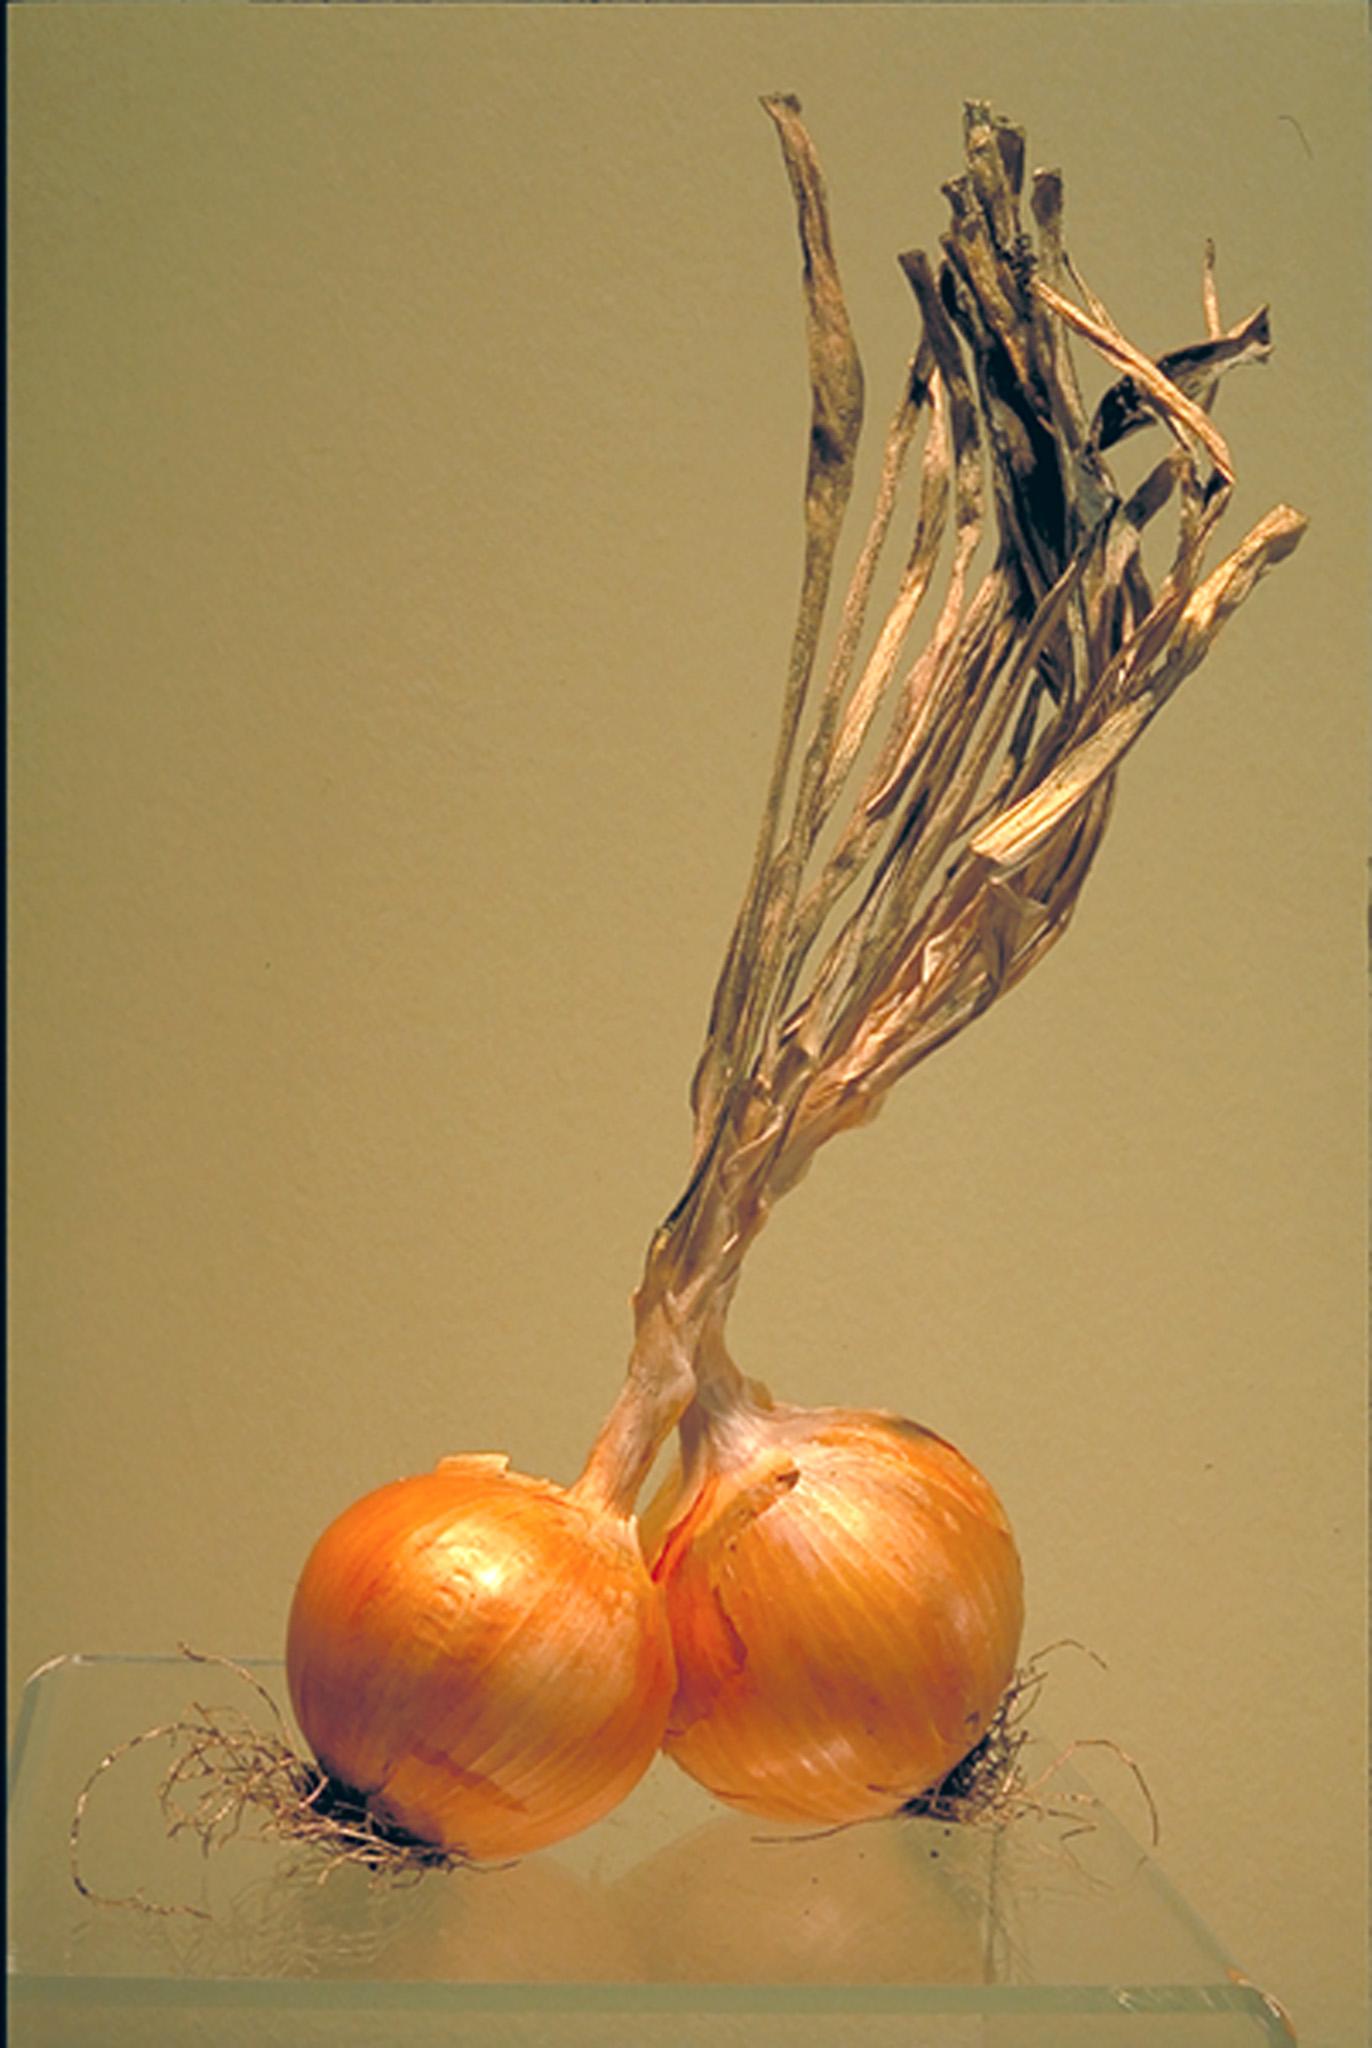 Onions, 2001